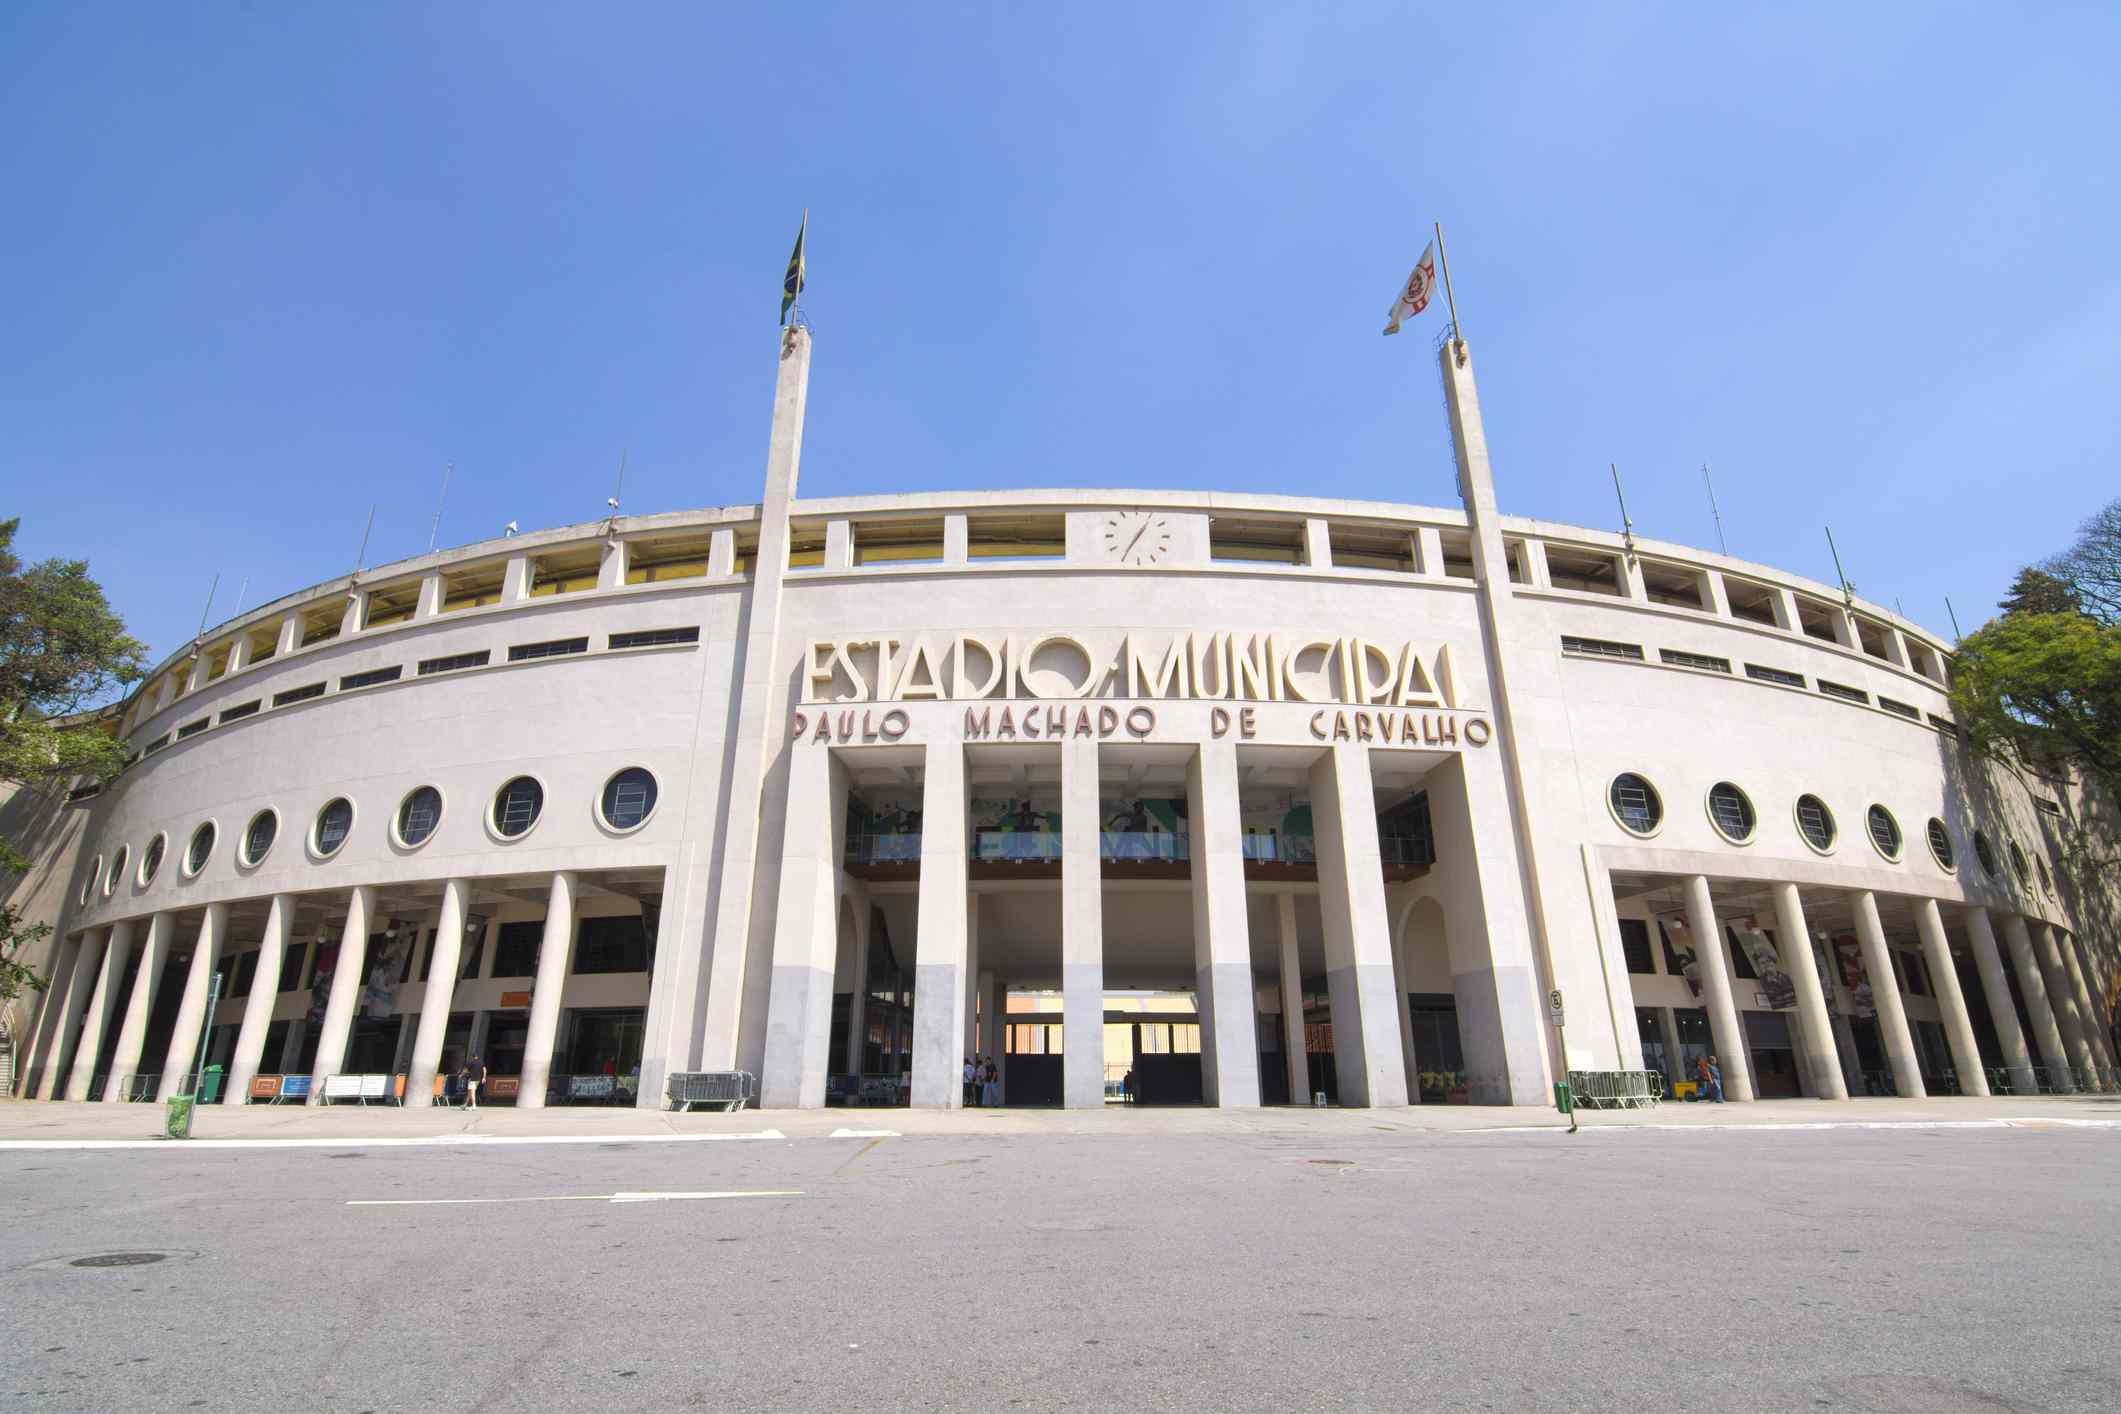 Sao Paulo, Brazil - September 23, 2015: Pacaembu Stadium (Estadio Municipal Paulo Machado de Carvalho) hosts professional soccer games and also is home to the Museum of Football (soccer) in Sao Paulo, Brazil